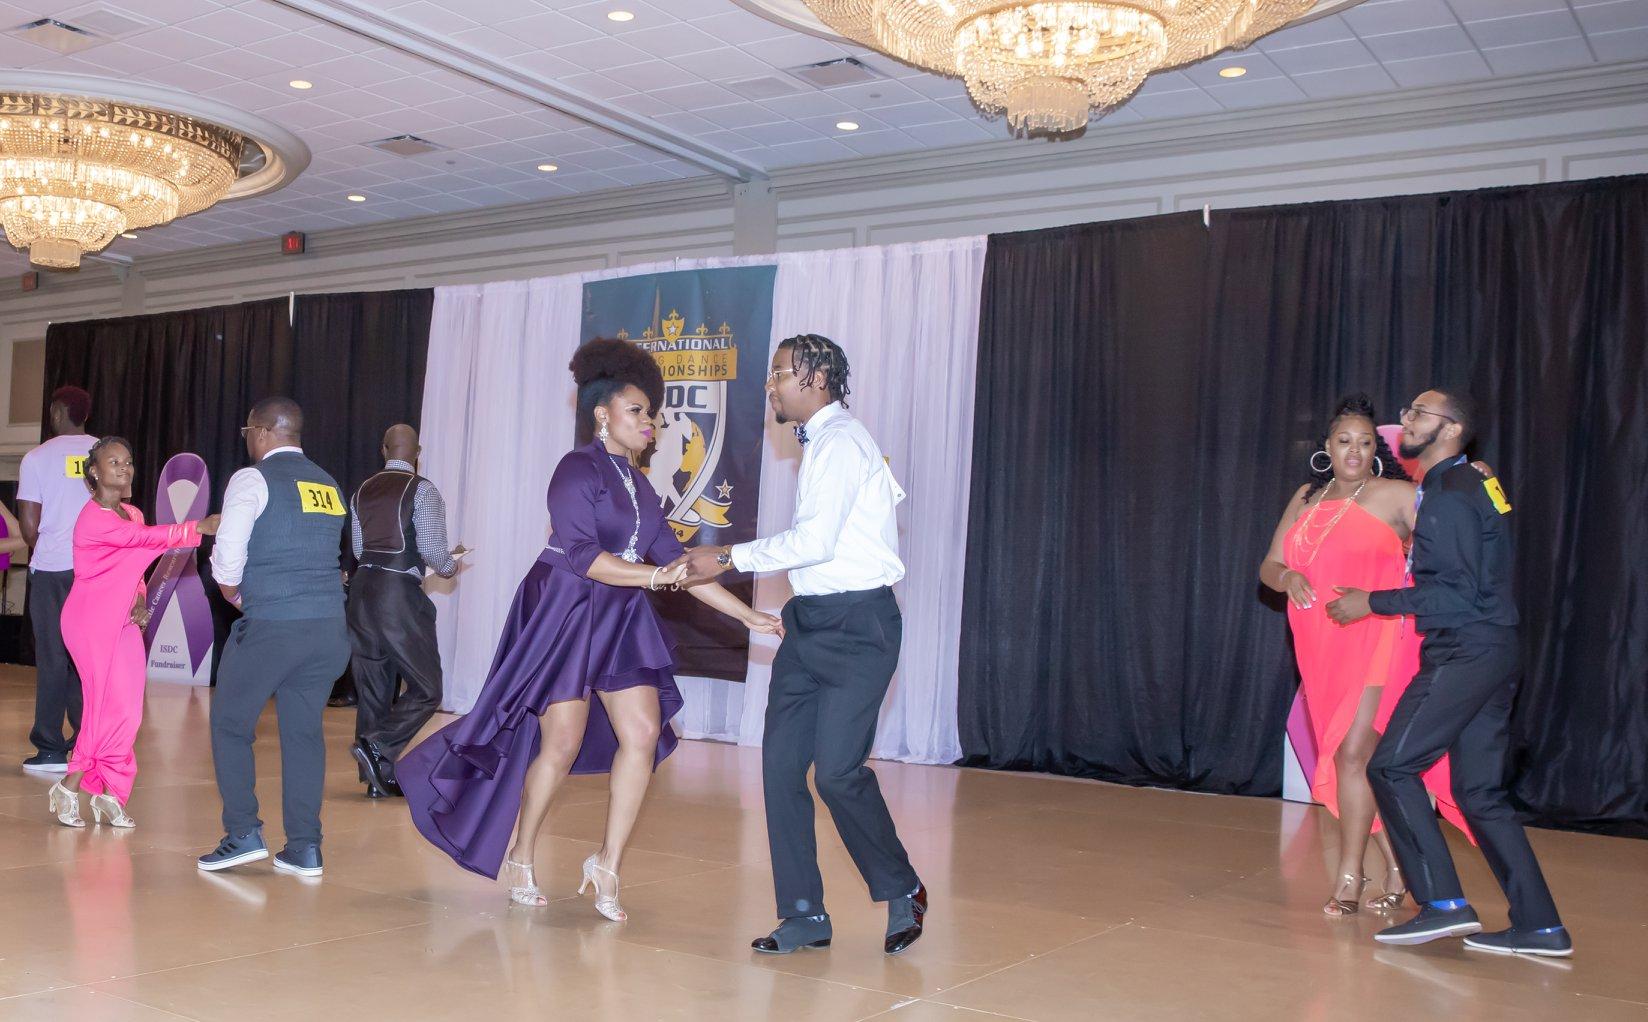 Registration International Swing Dance Championships